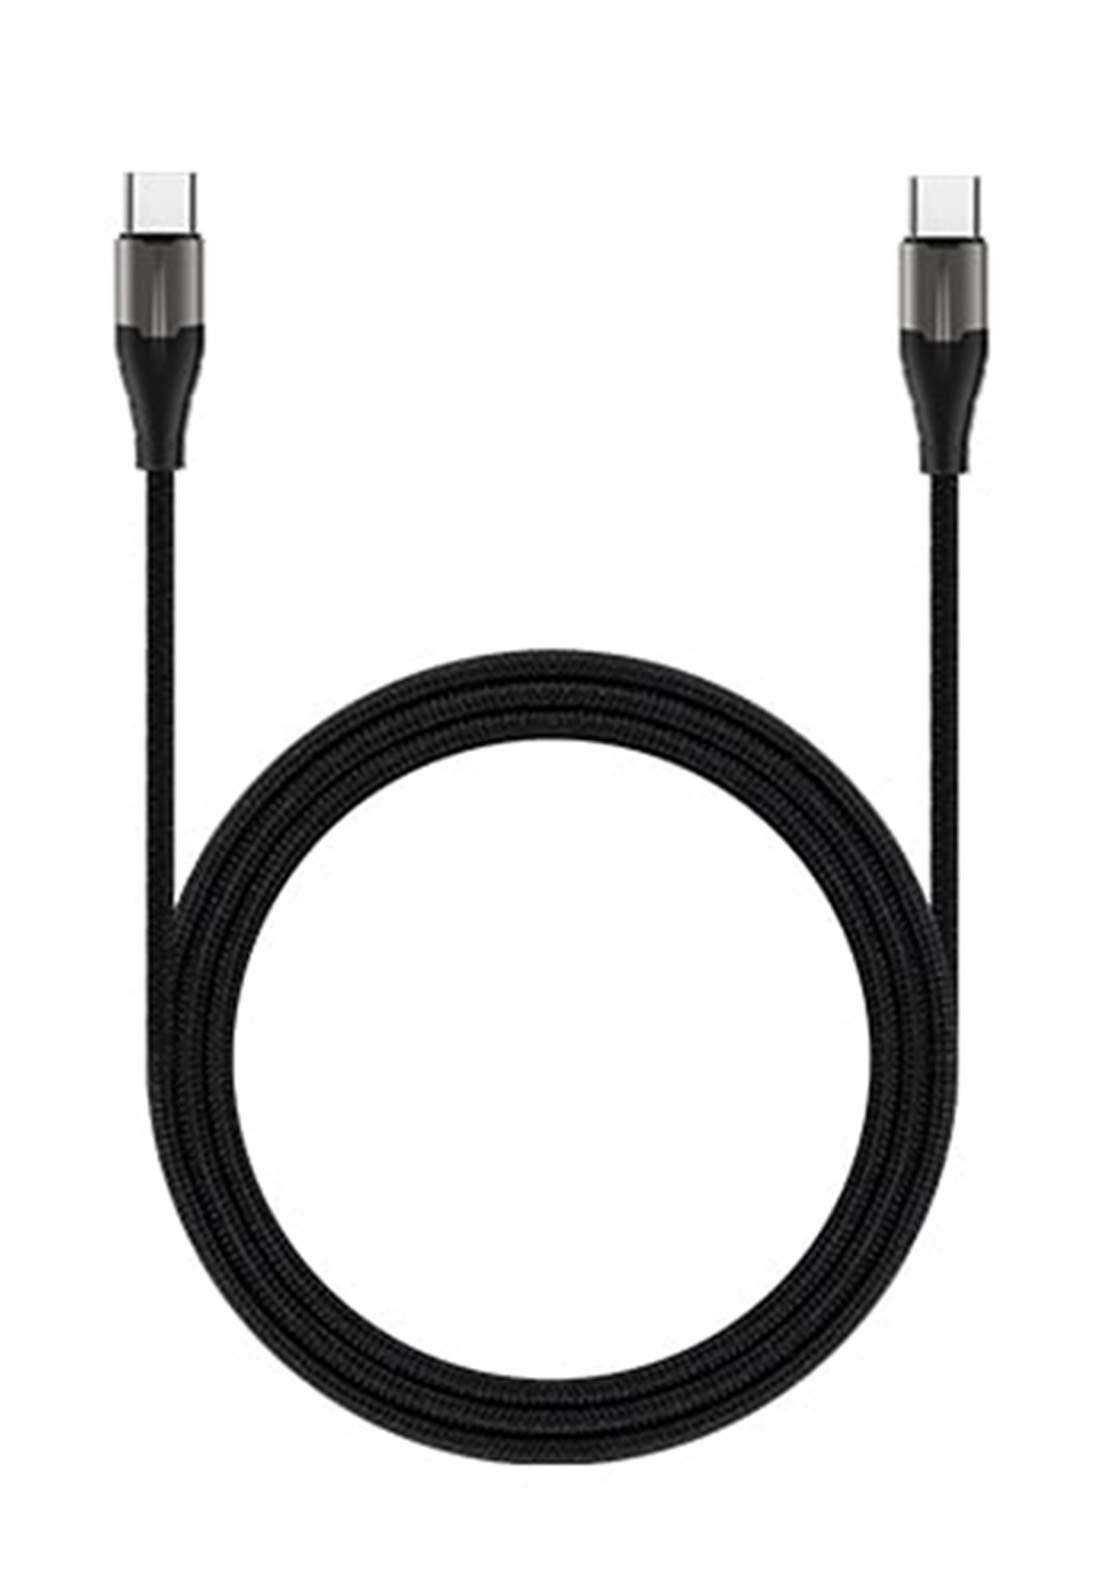 (4200)RockRose RRCS09CC1 USB Type-C to Type-C Cable 1m - Black كابل